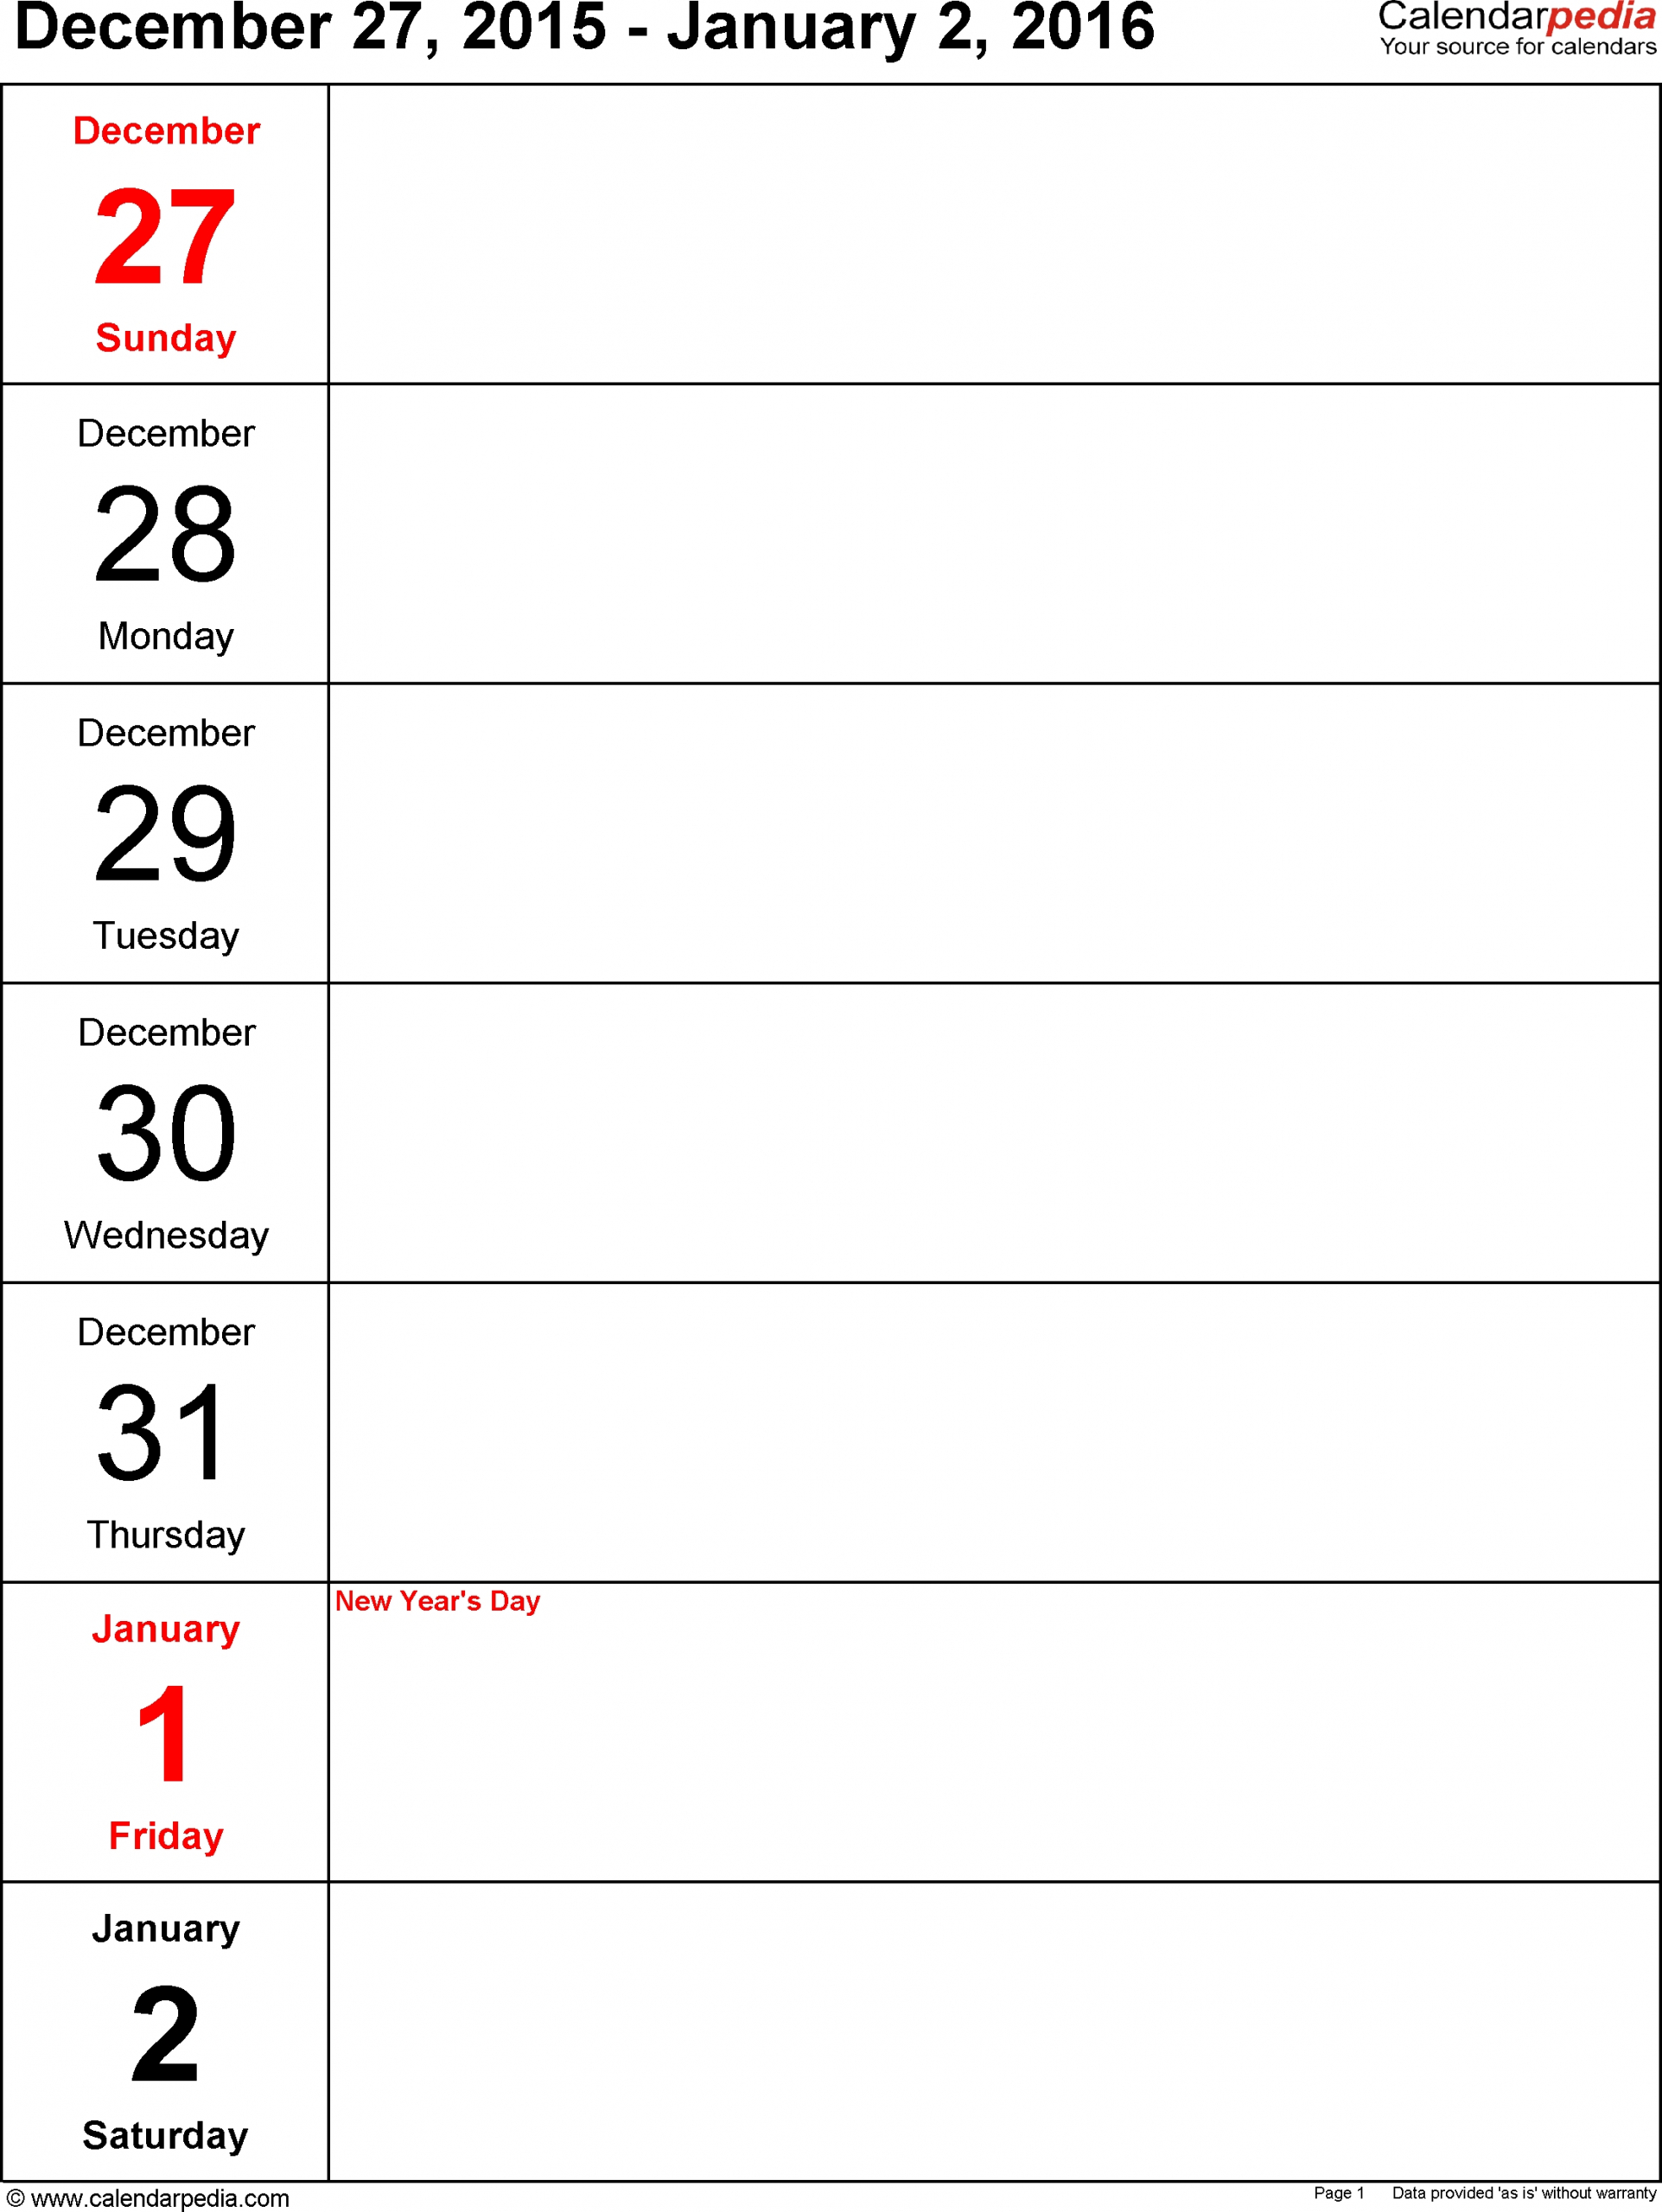 5 Day Weekly Calendar Printable | Printable Calendar in 5 Day Calendar Template Word